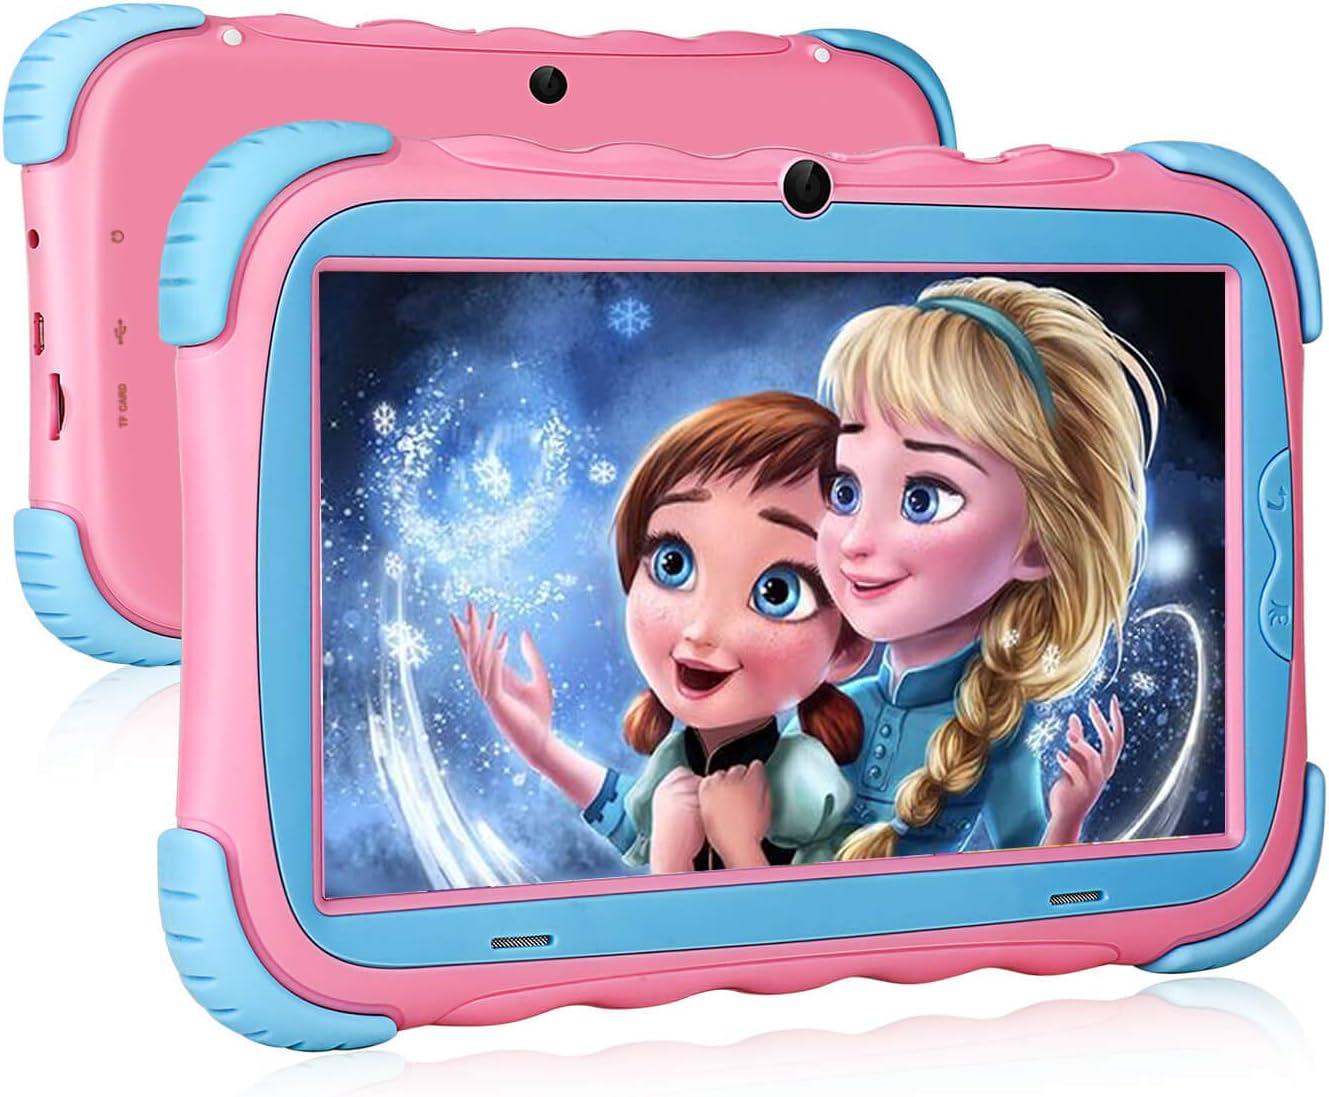 Kids Genuine Tablet 7 inch IPS Display 1G Installed Pre 16GB Wi Max 87% OFF iWAWA